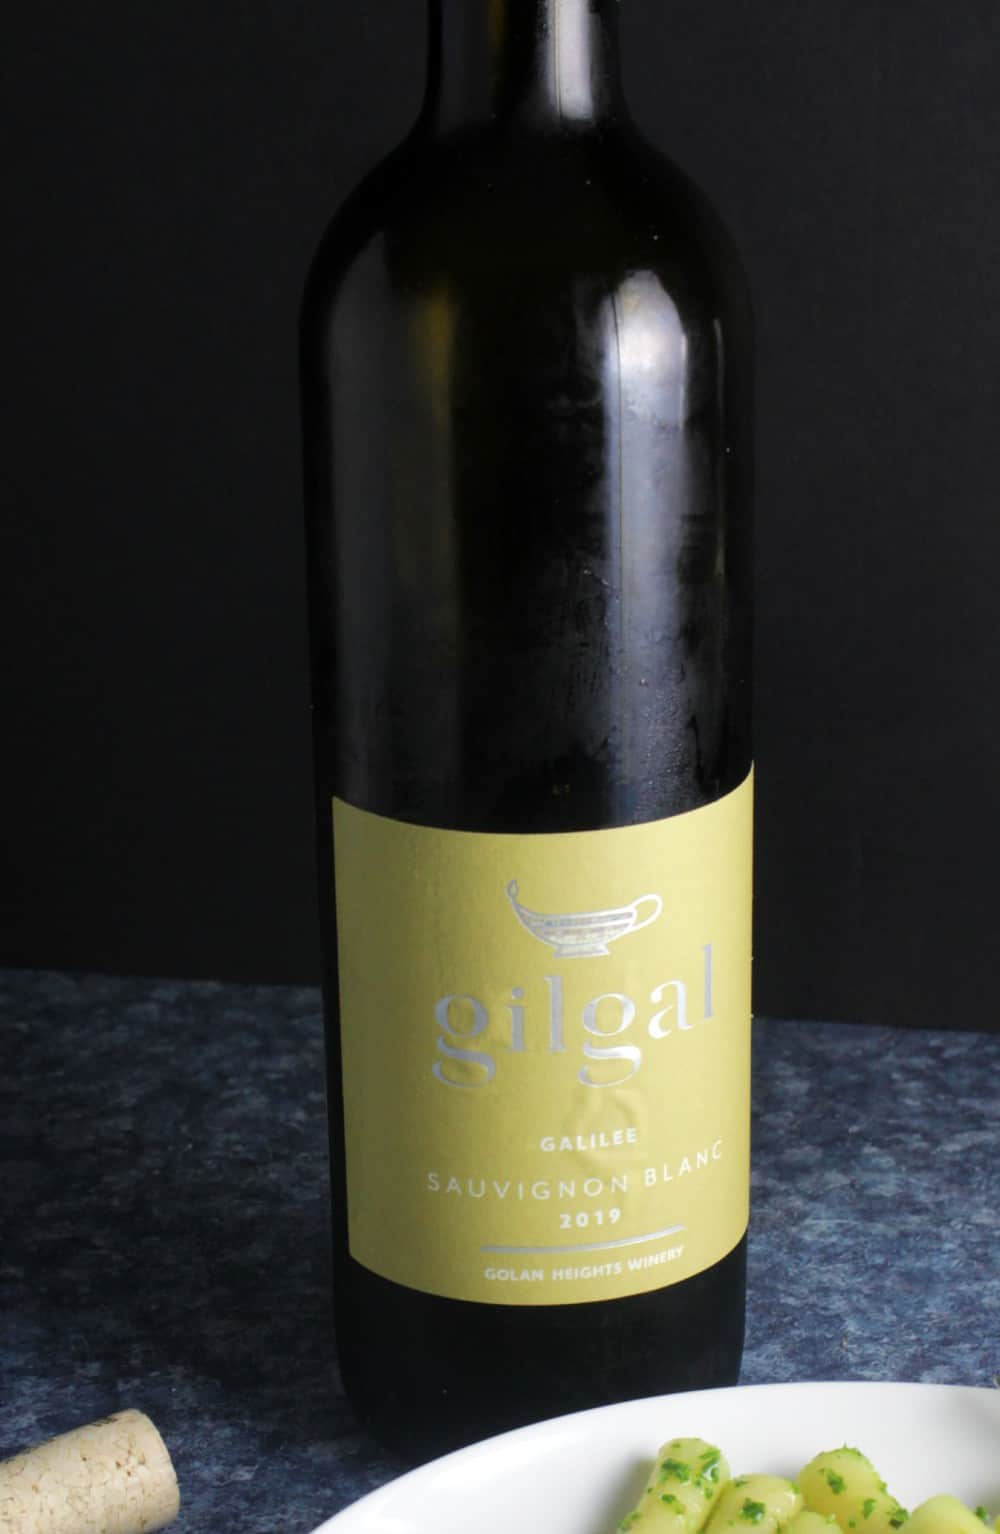 bottle of Gilgal Sauvignon Blanc.